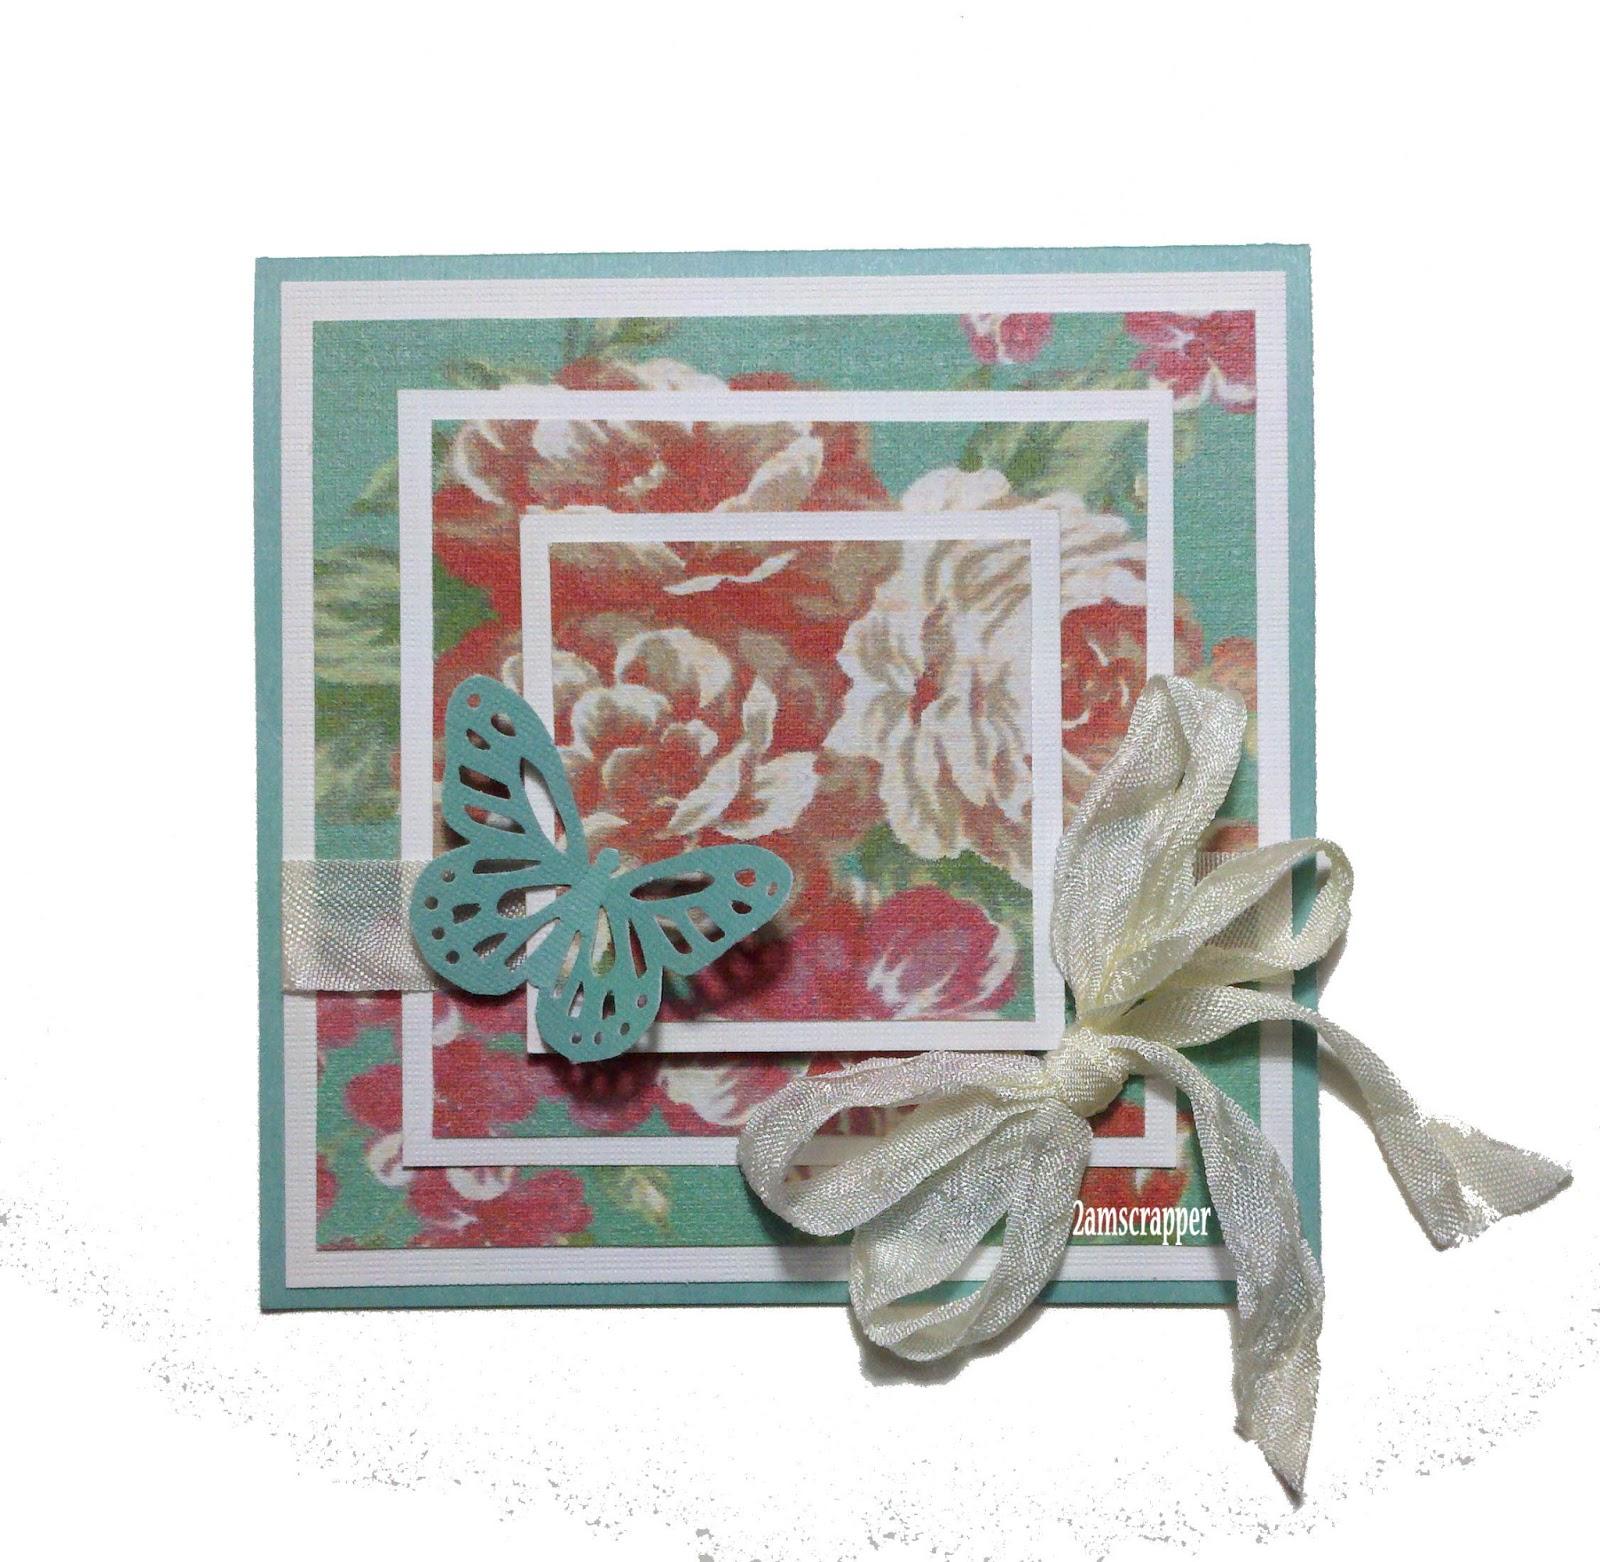 Lotsa Scrap From 2amscrapper A Layered Floral Card